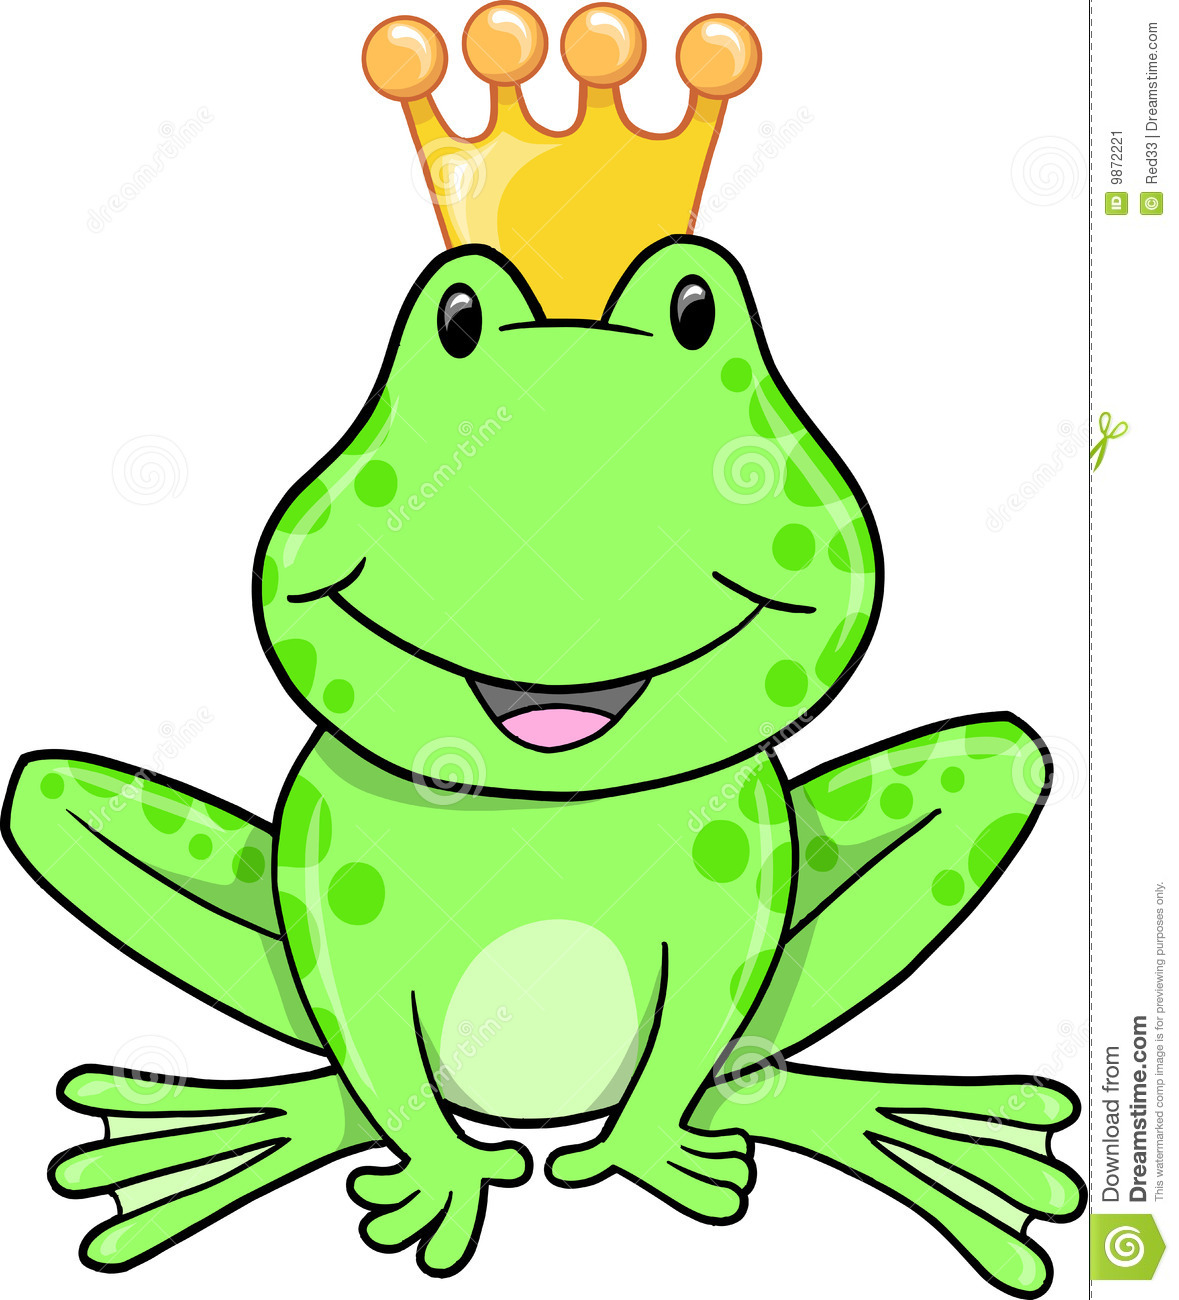 cute frog prince clipart clipart panda free clipart images rh clipartpanda com frog prince clipart free Printable Frog Prince